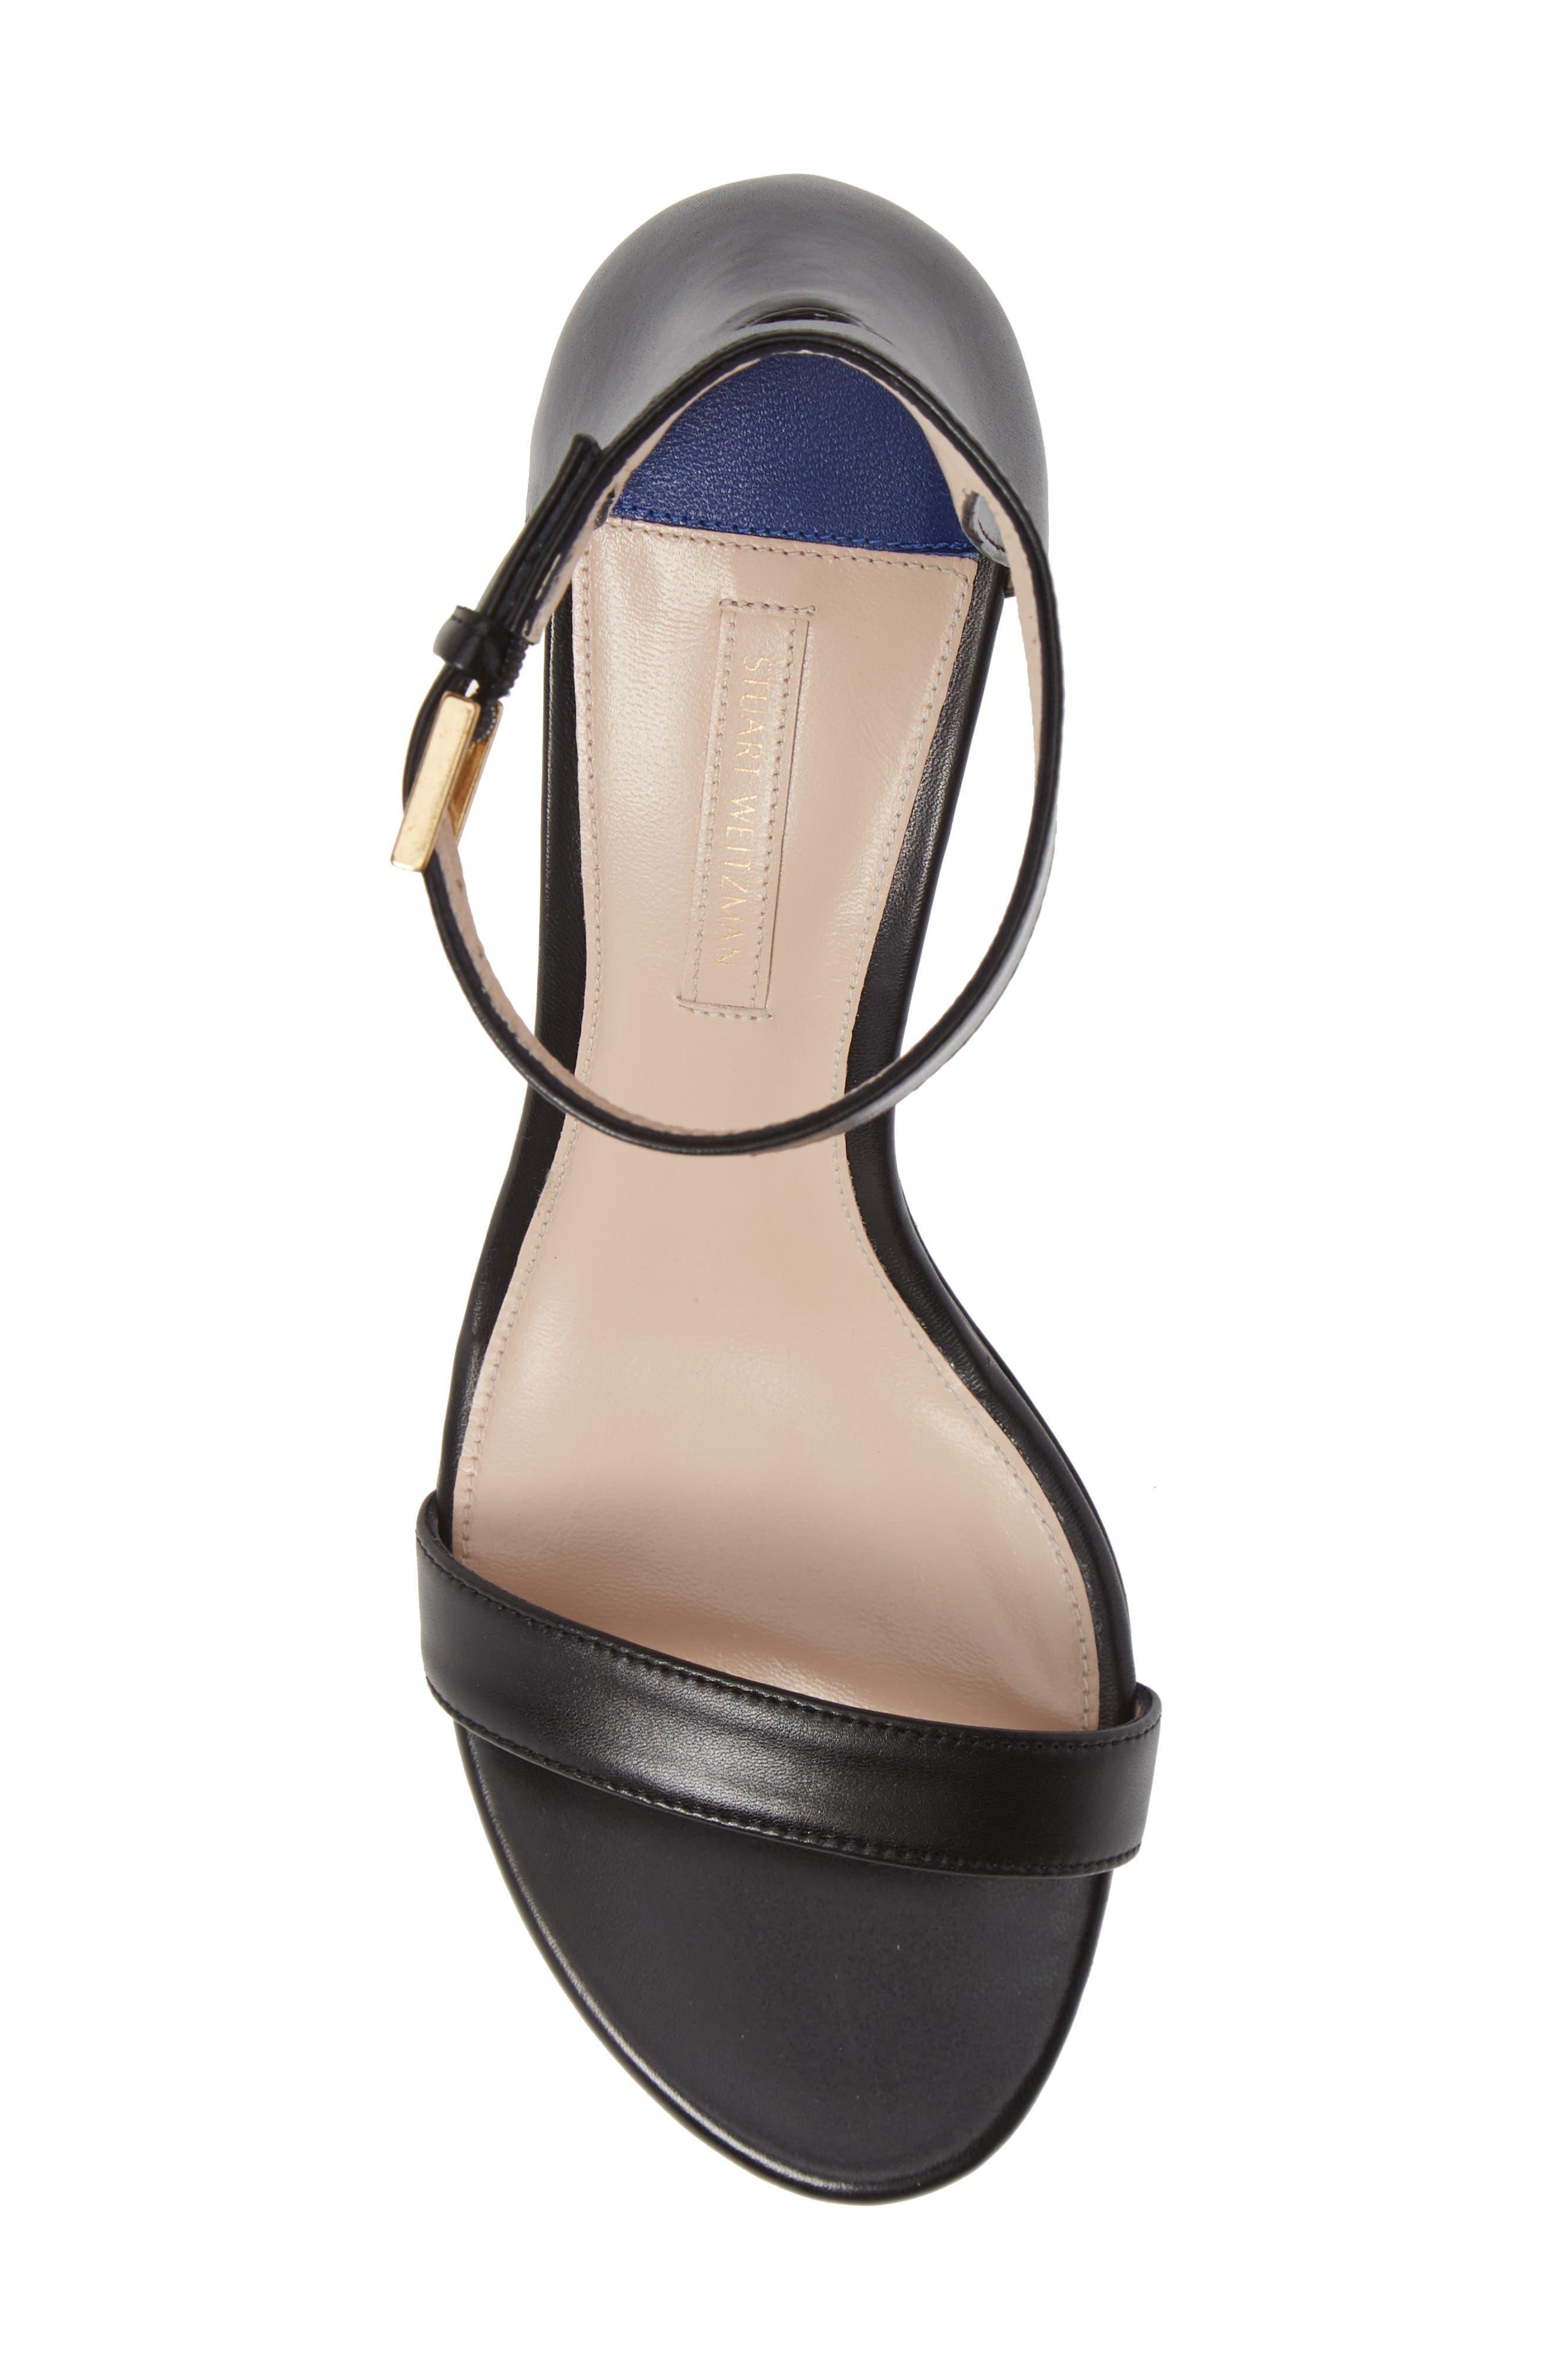 75LESSNUDIST Ankle Strap Sandal,                             Alternate thumbnail 5, color,                             BLACK NAPPA